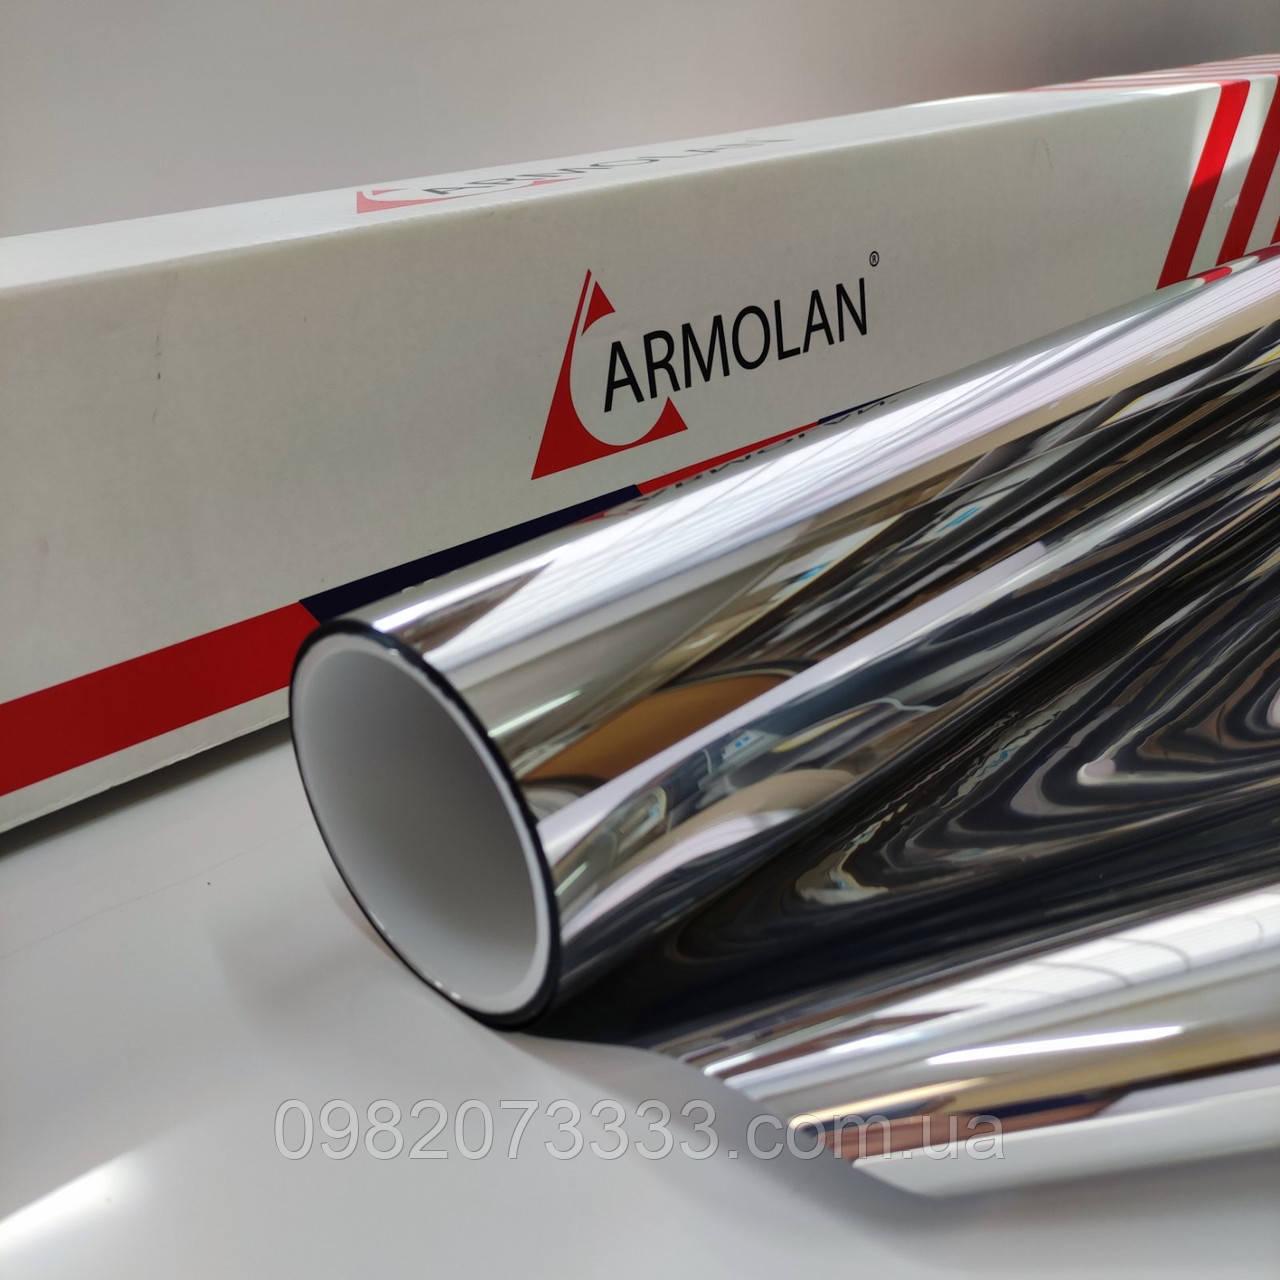 Солнцезащитная плёнка Armolan Silver 5% USA зеркальная для тонировки окон. Цена за размер 150х50см.